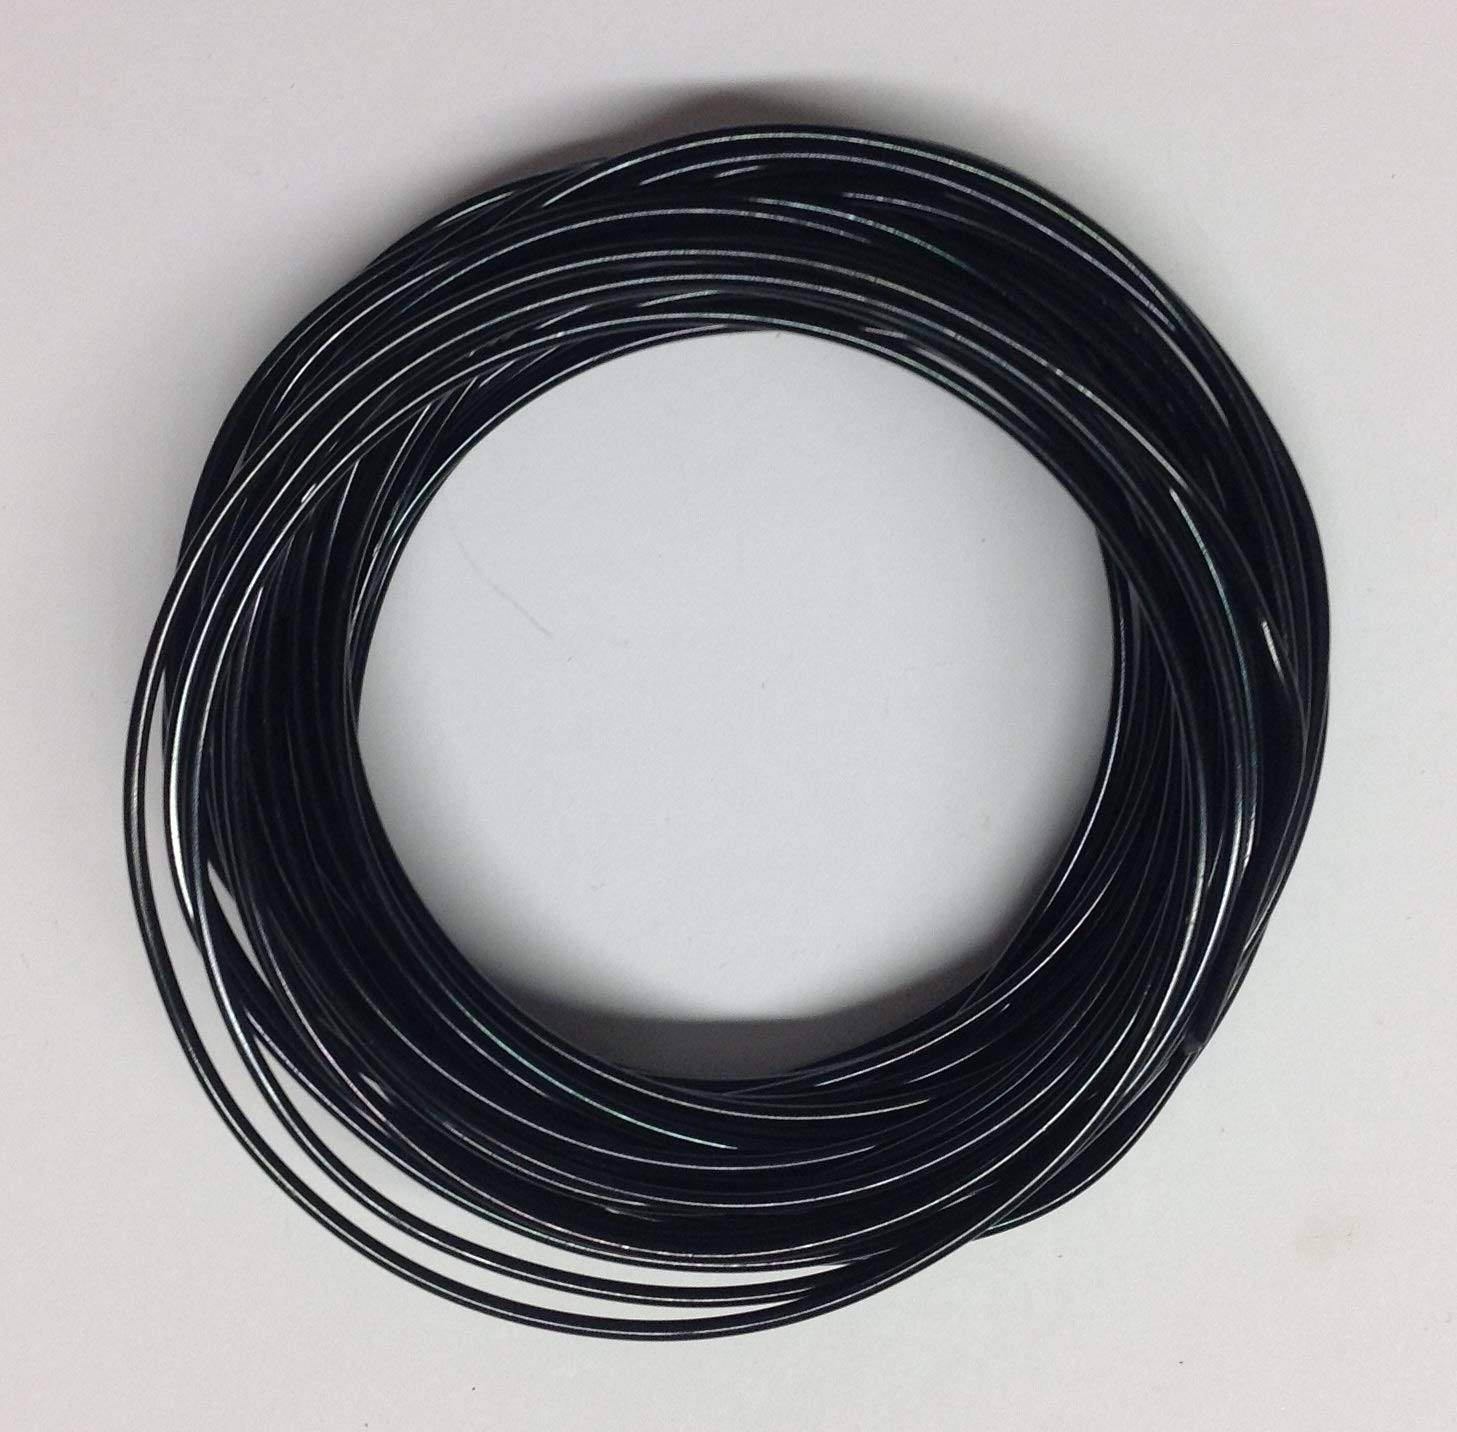 Celloexpress Aluminium Craft Wire 3mm X 5m Diameter Length Wiring White Black Silver Gold